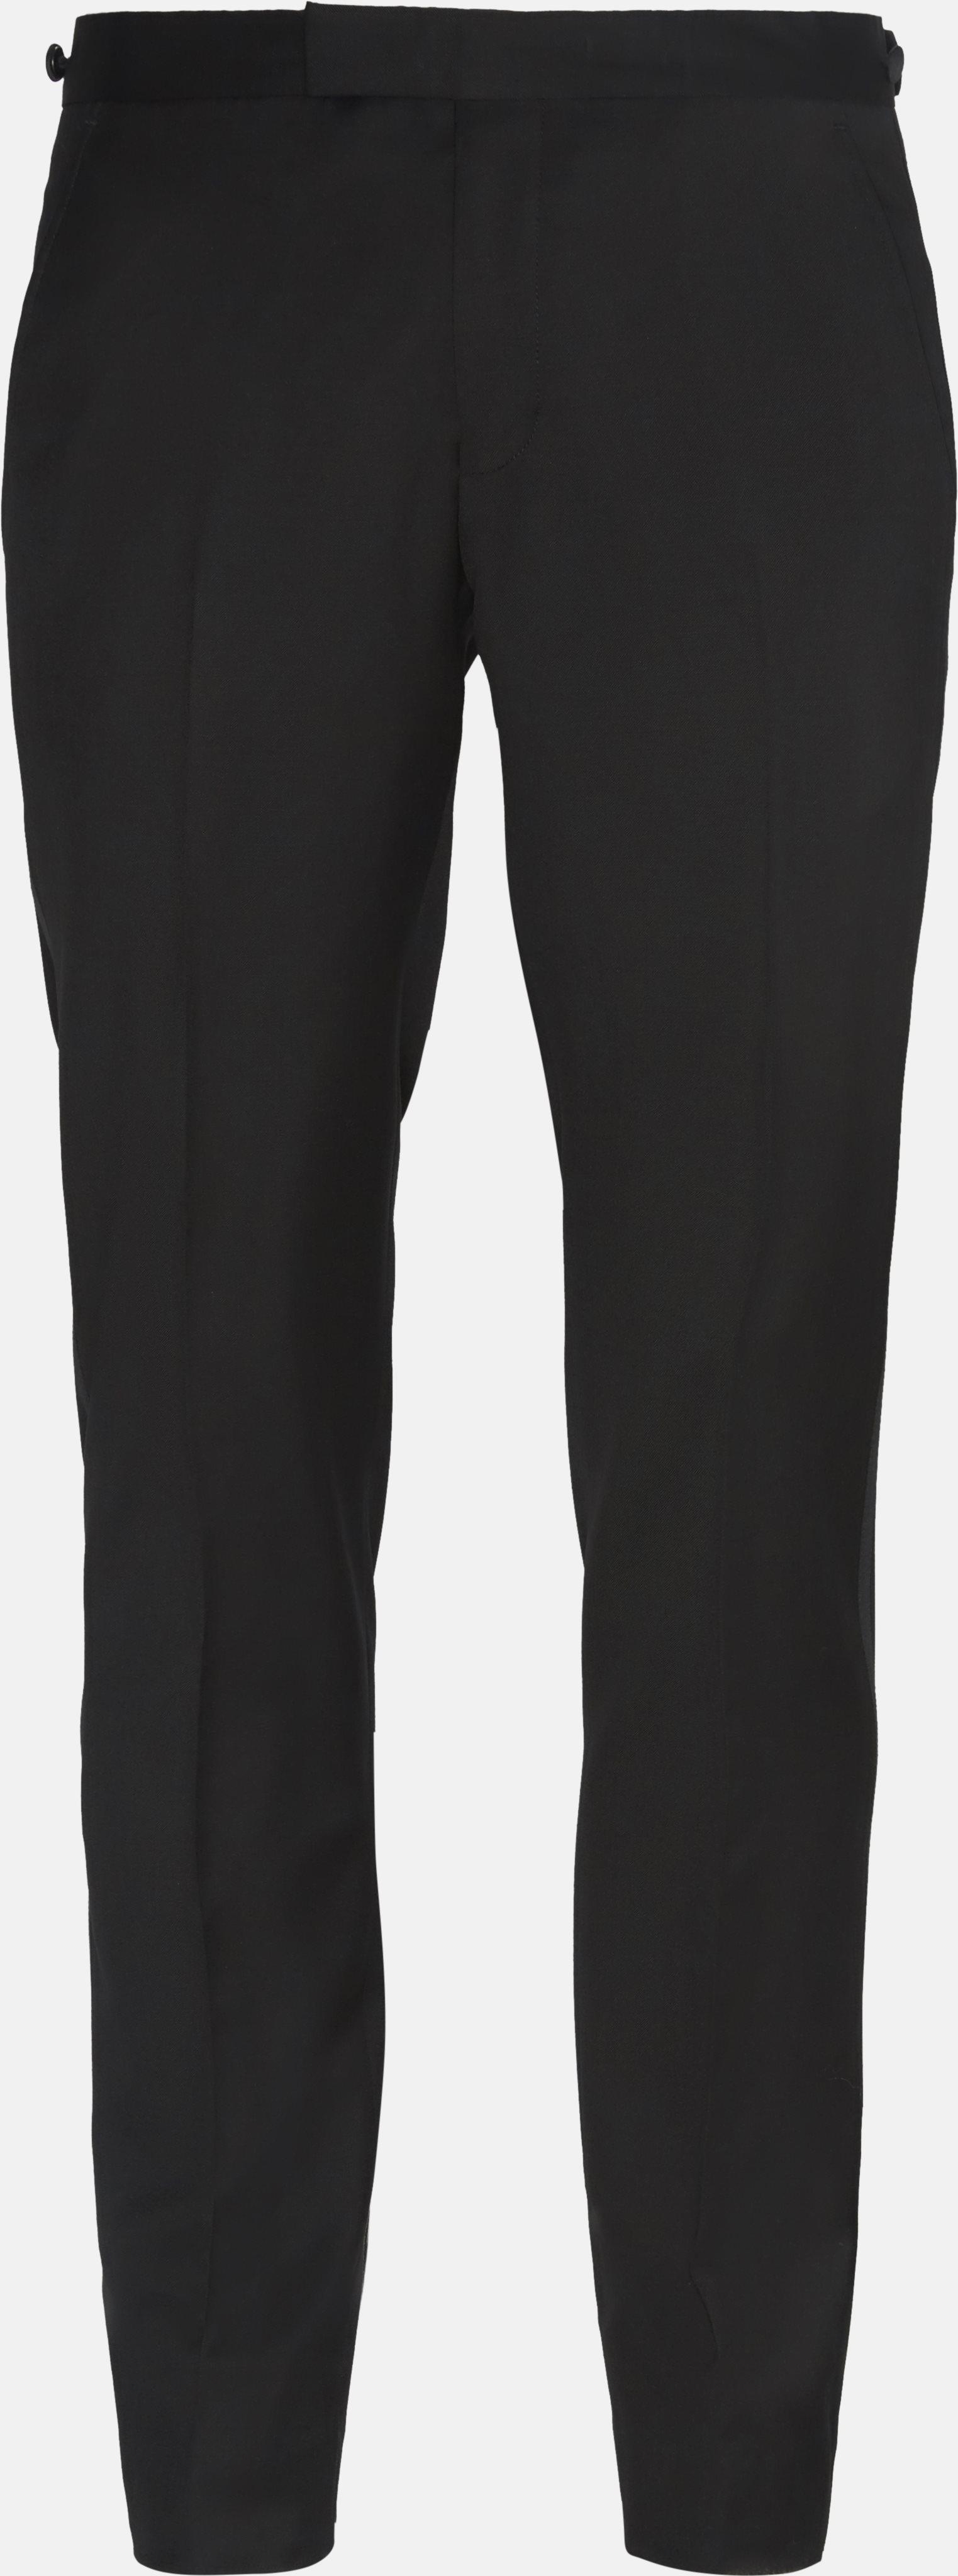 Trousers - Slim - Black